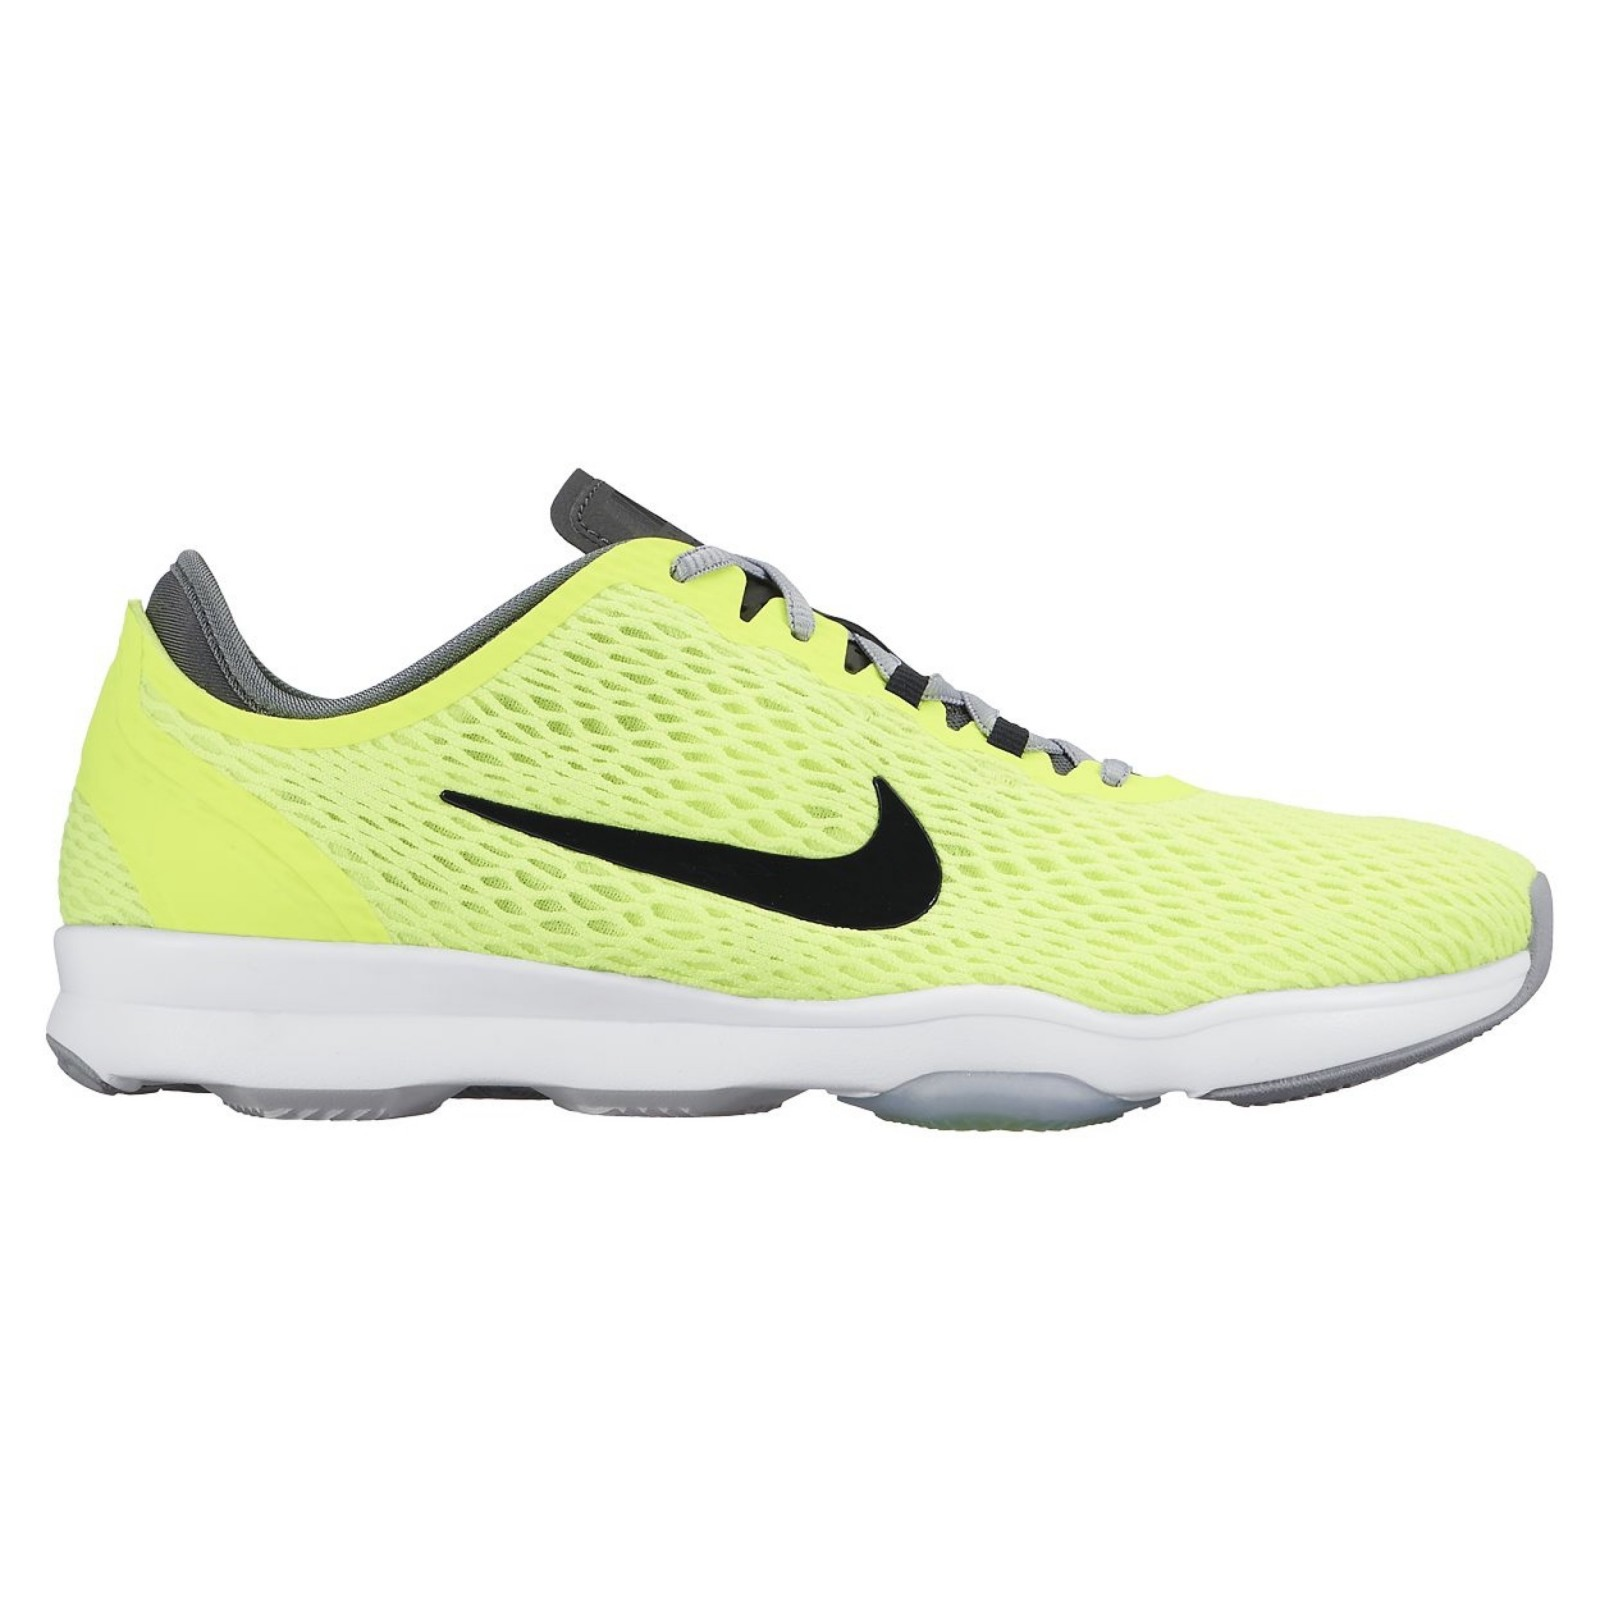 8f57c939ffe Dámská fitness obuv Nike WMNS ZOOM FIT